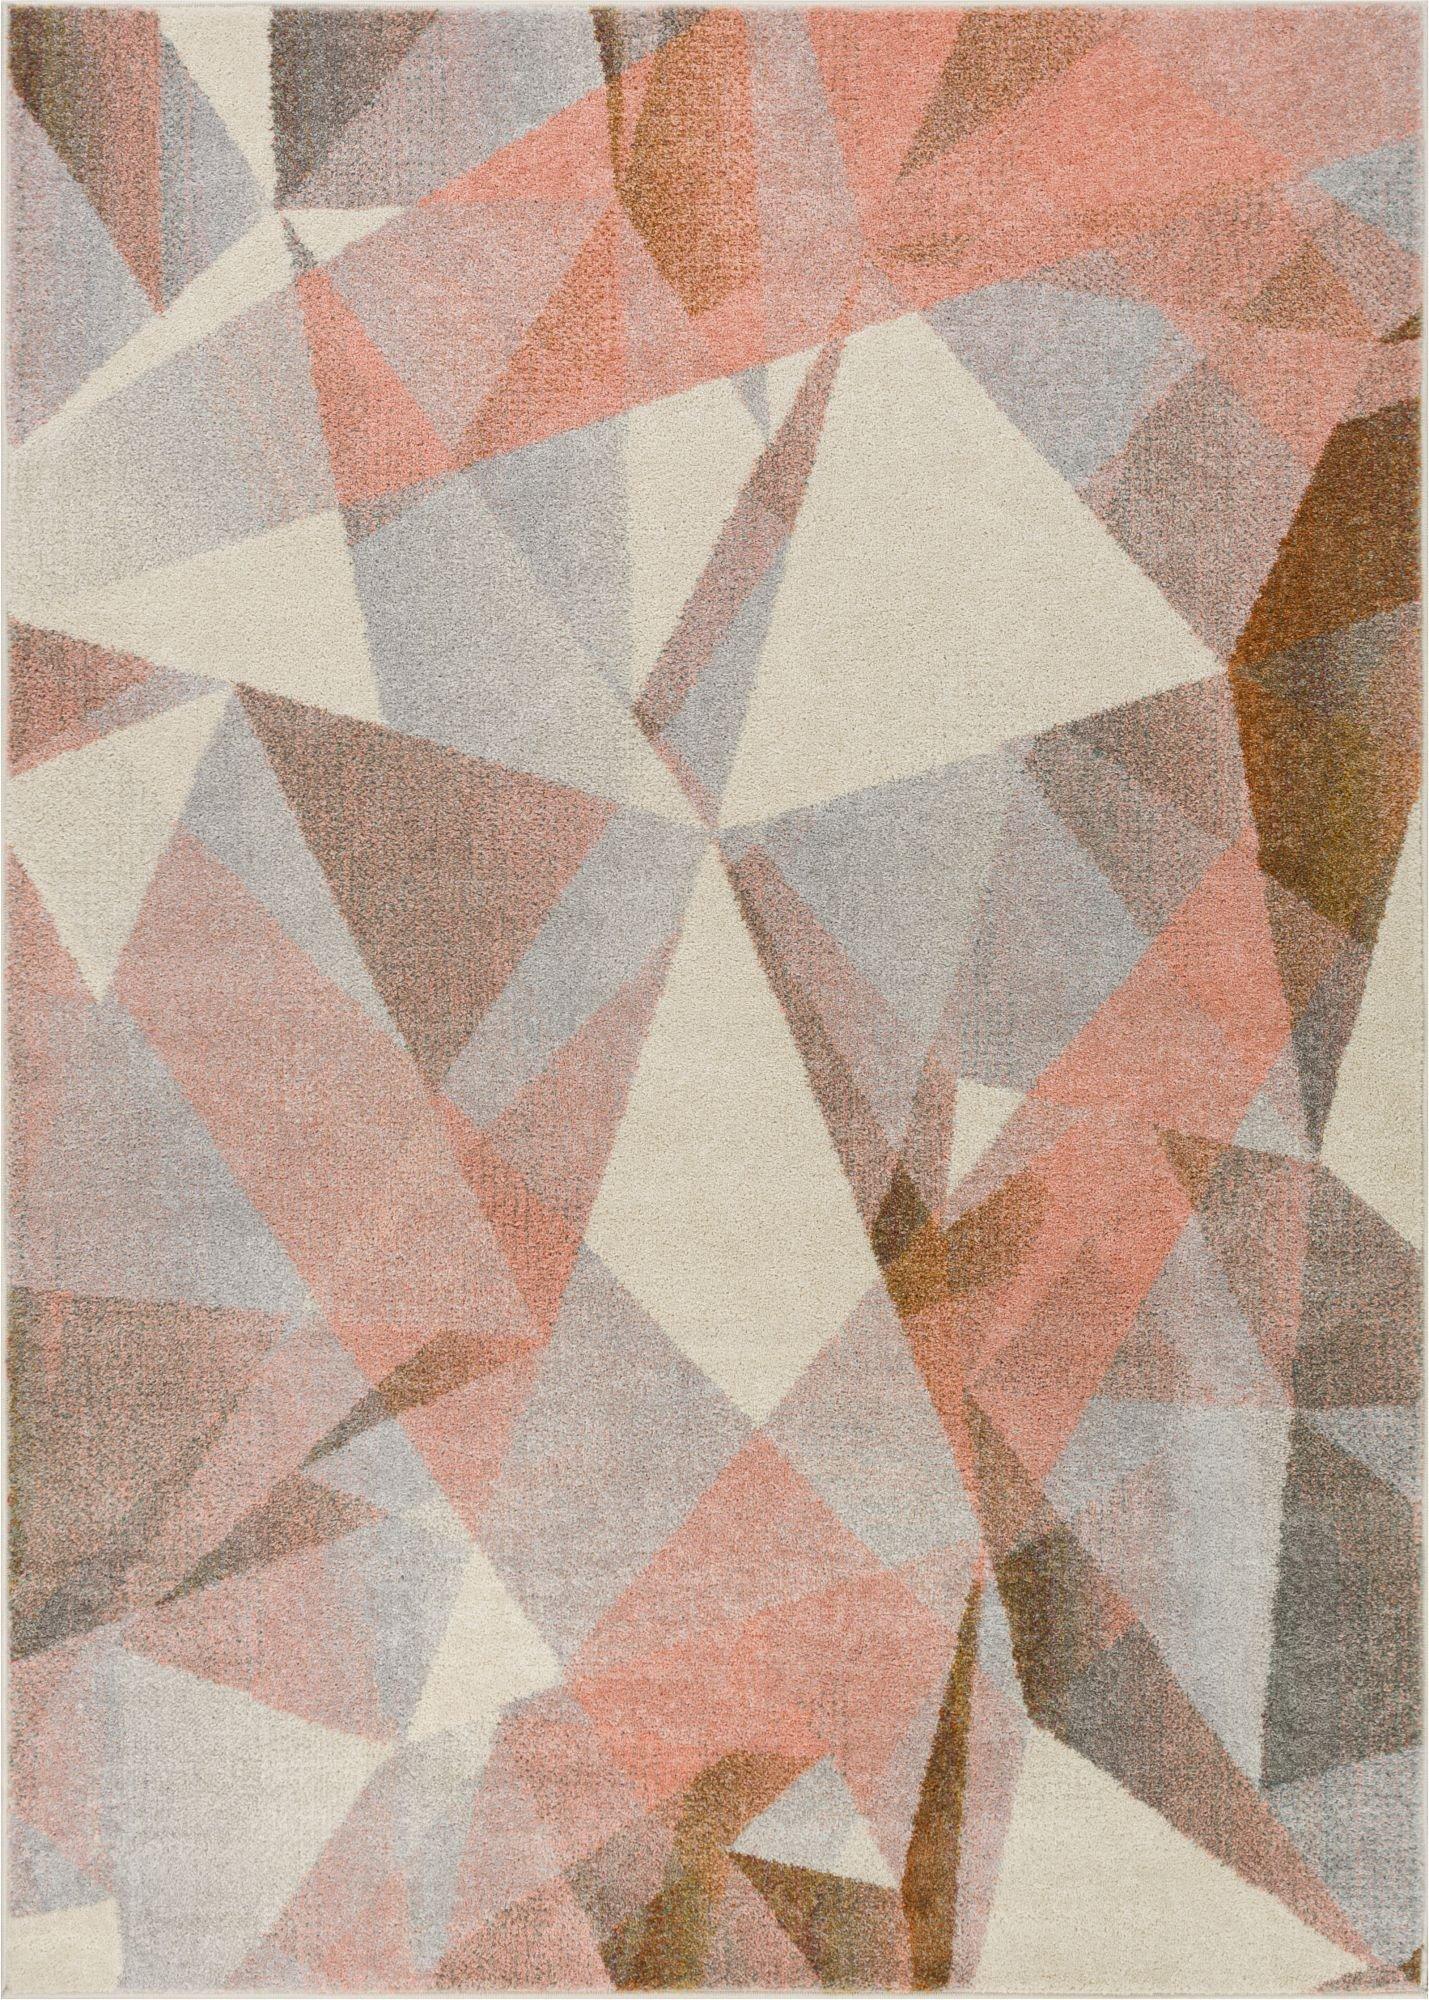 naomi tranquil pink mid-century modern rug TYFKPGK